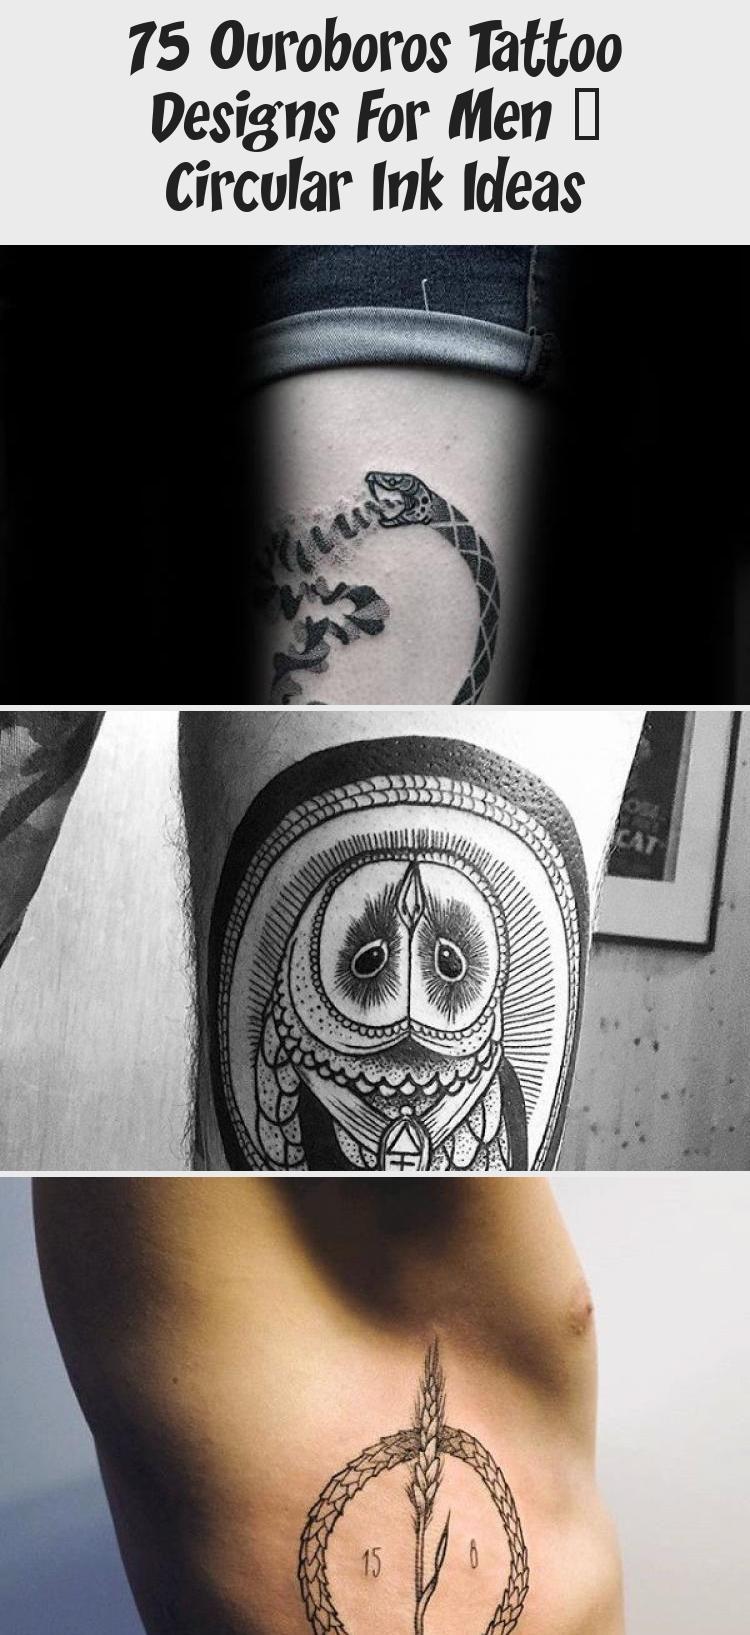 75 Ouroboros Tattoo Designs For Men Circular Ink Ideas